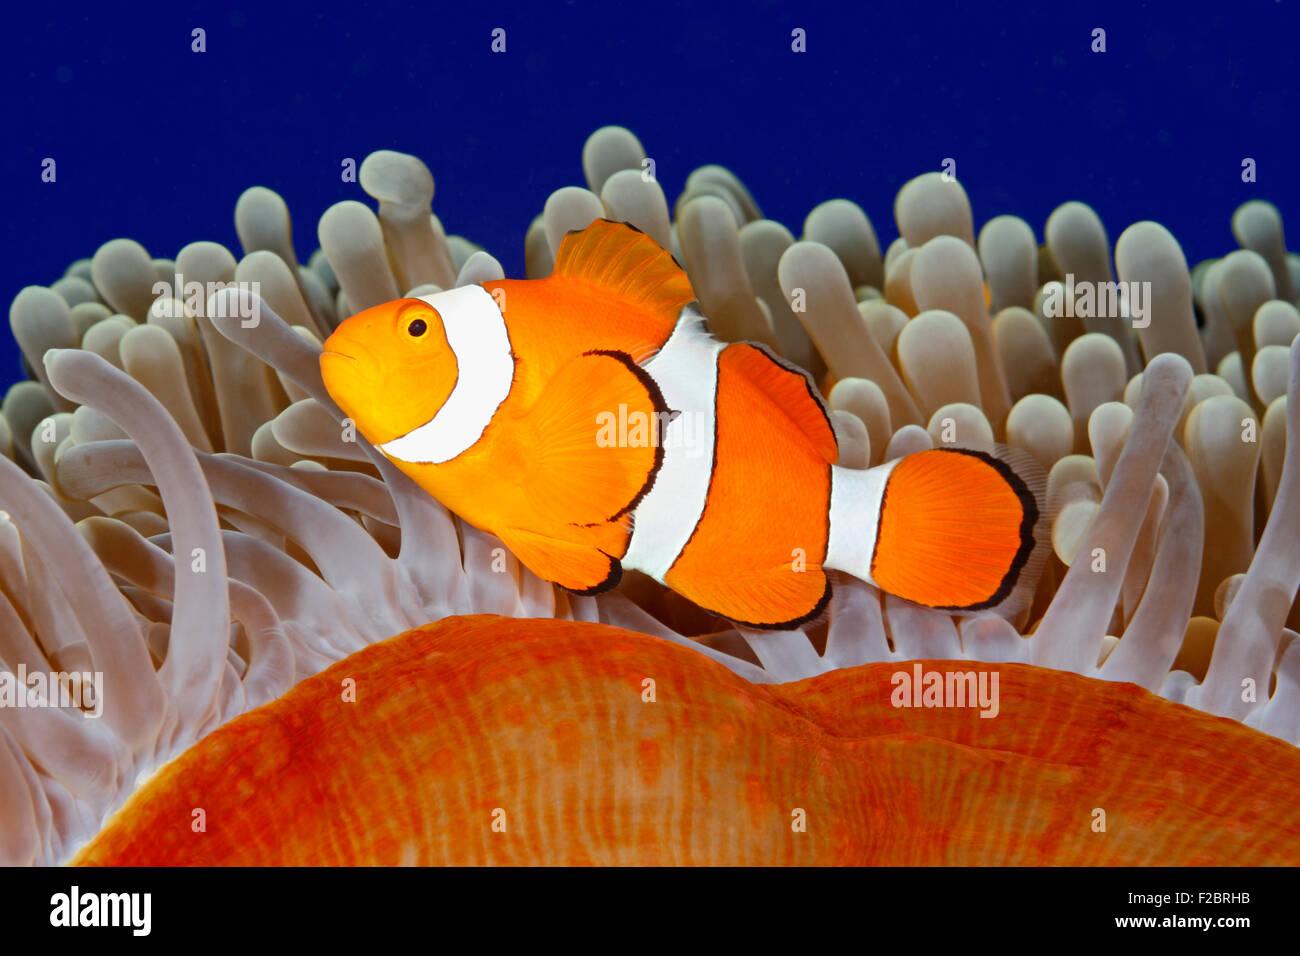 clown-anemonefish-amphiprion-percula-swimming-among-the-tentacles-F2BRHB.jpg